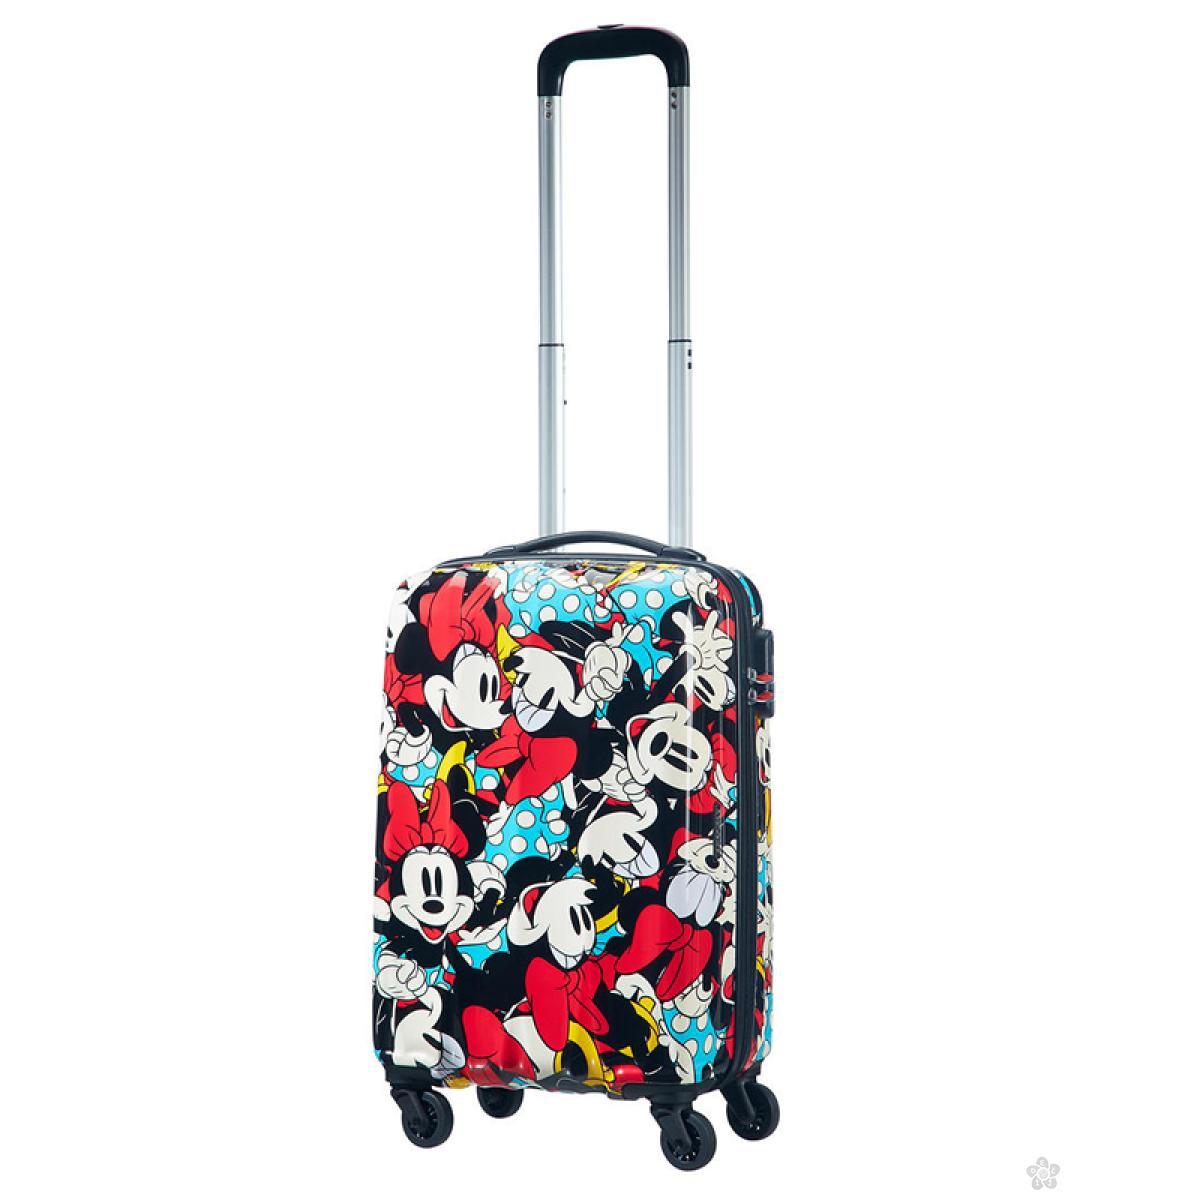 American Tourister kofer Minnie 65cm 19C-10007